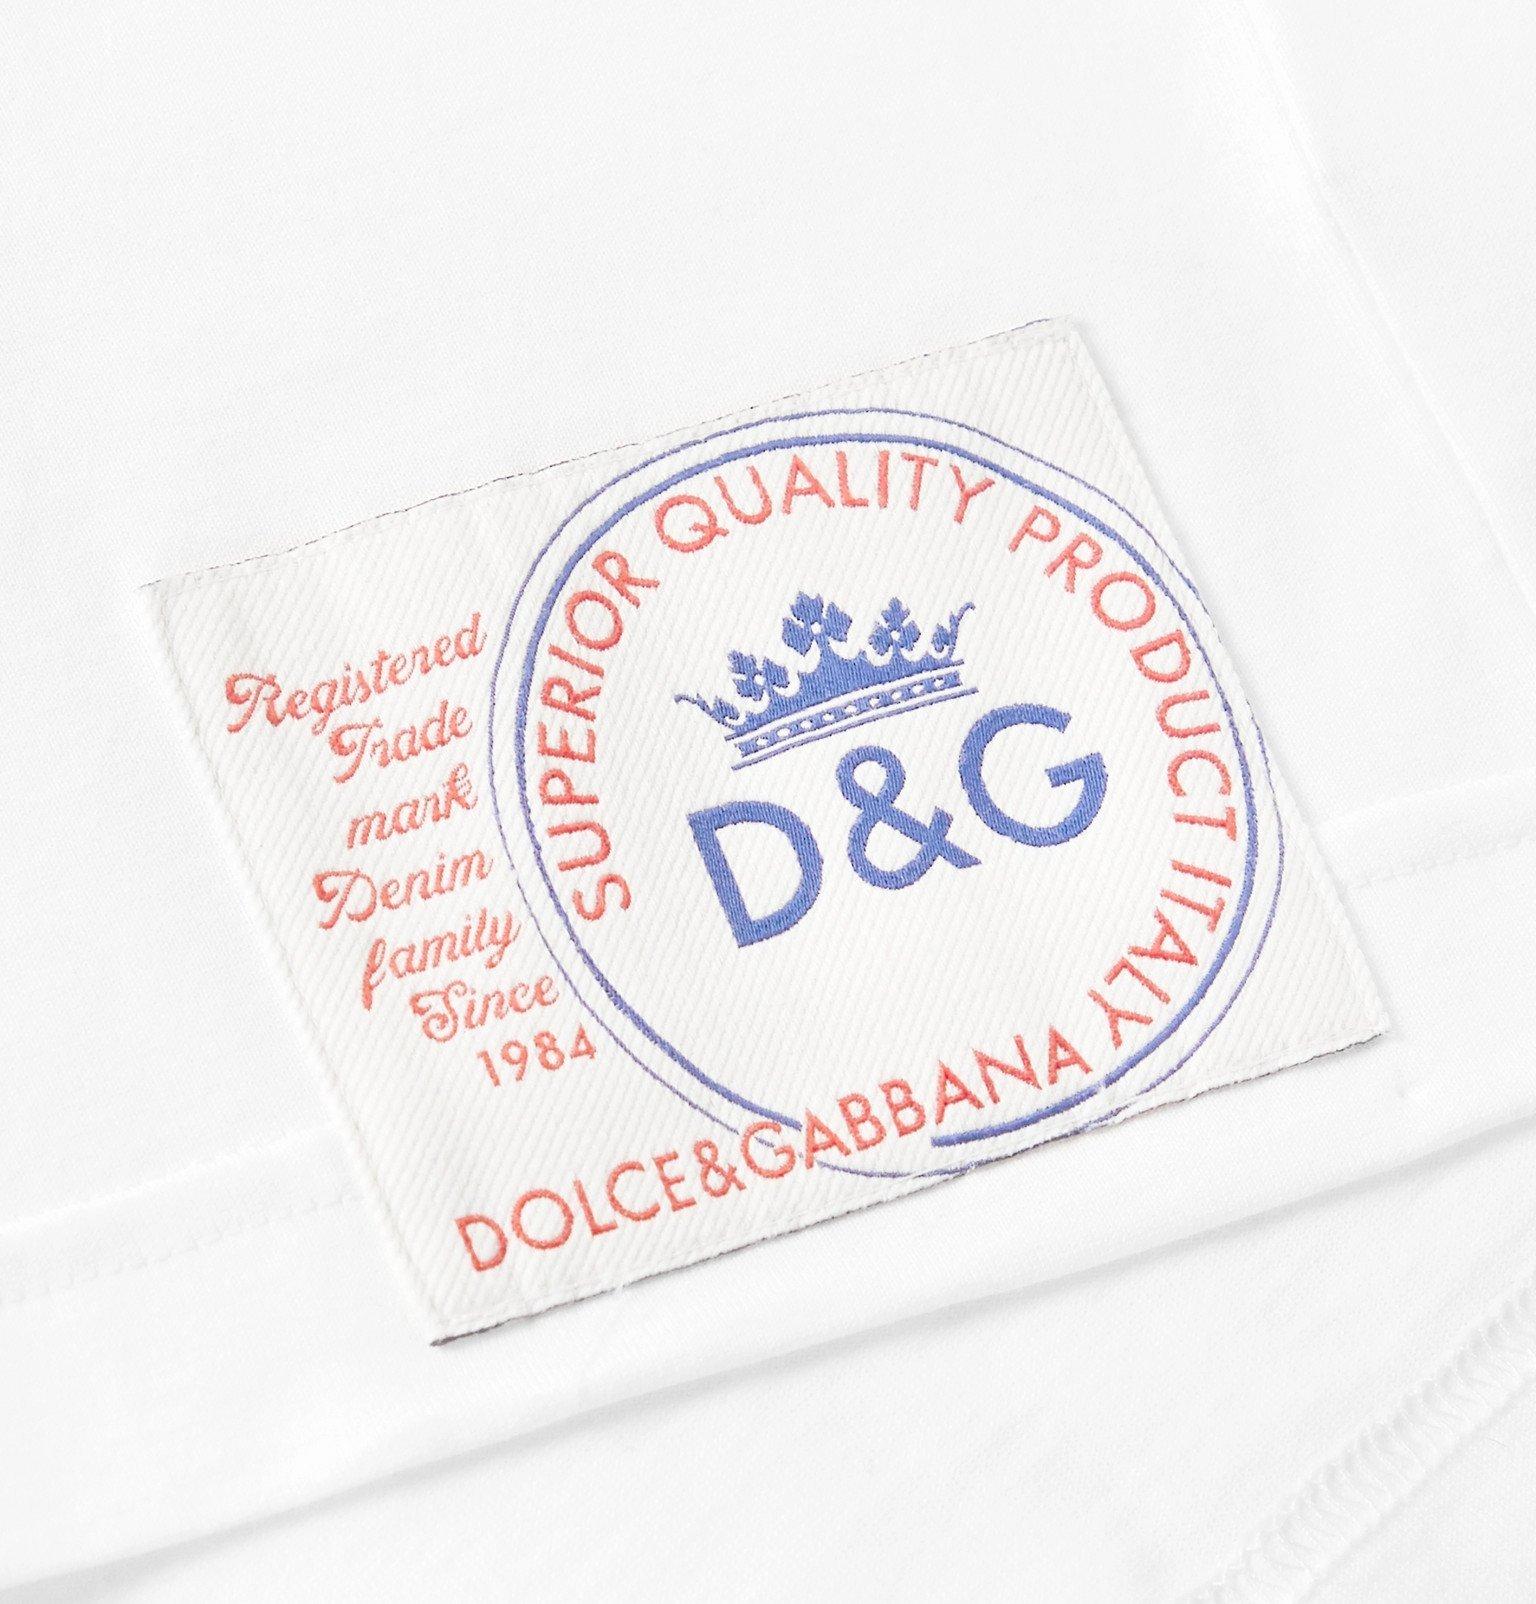 Dolce & Gabbana - Slim-Fit Logo-Appliquéd Cotton-Jersey T-Shirt - White